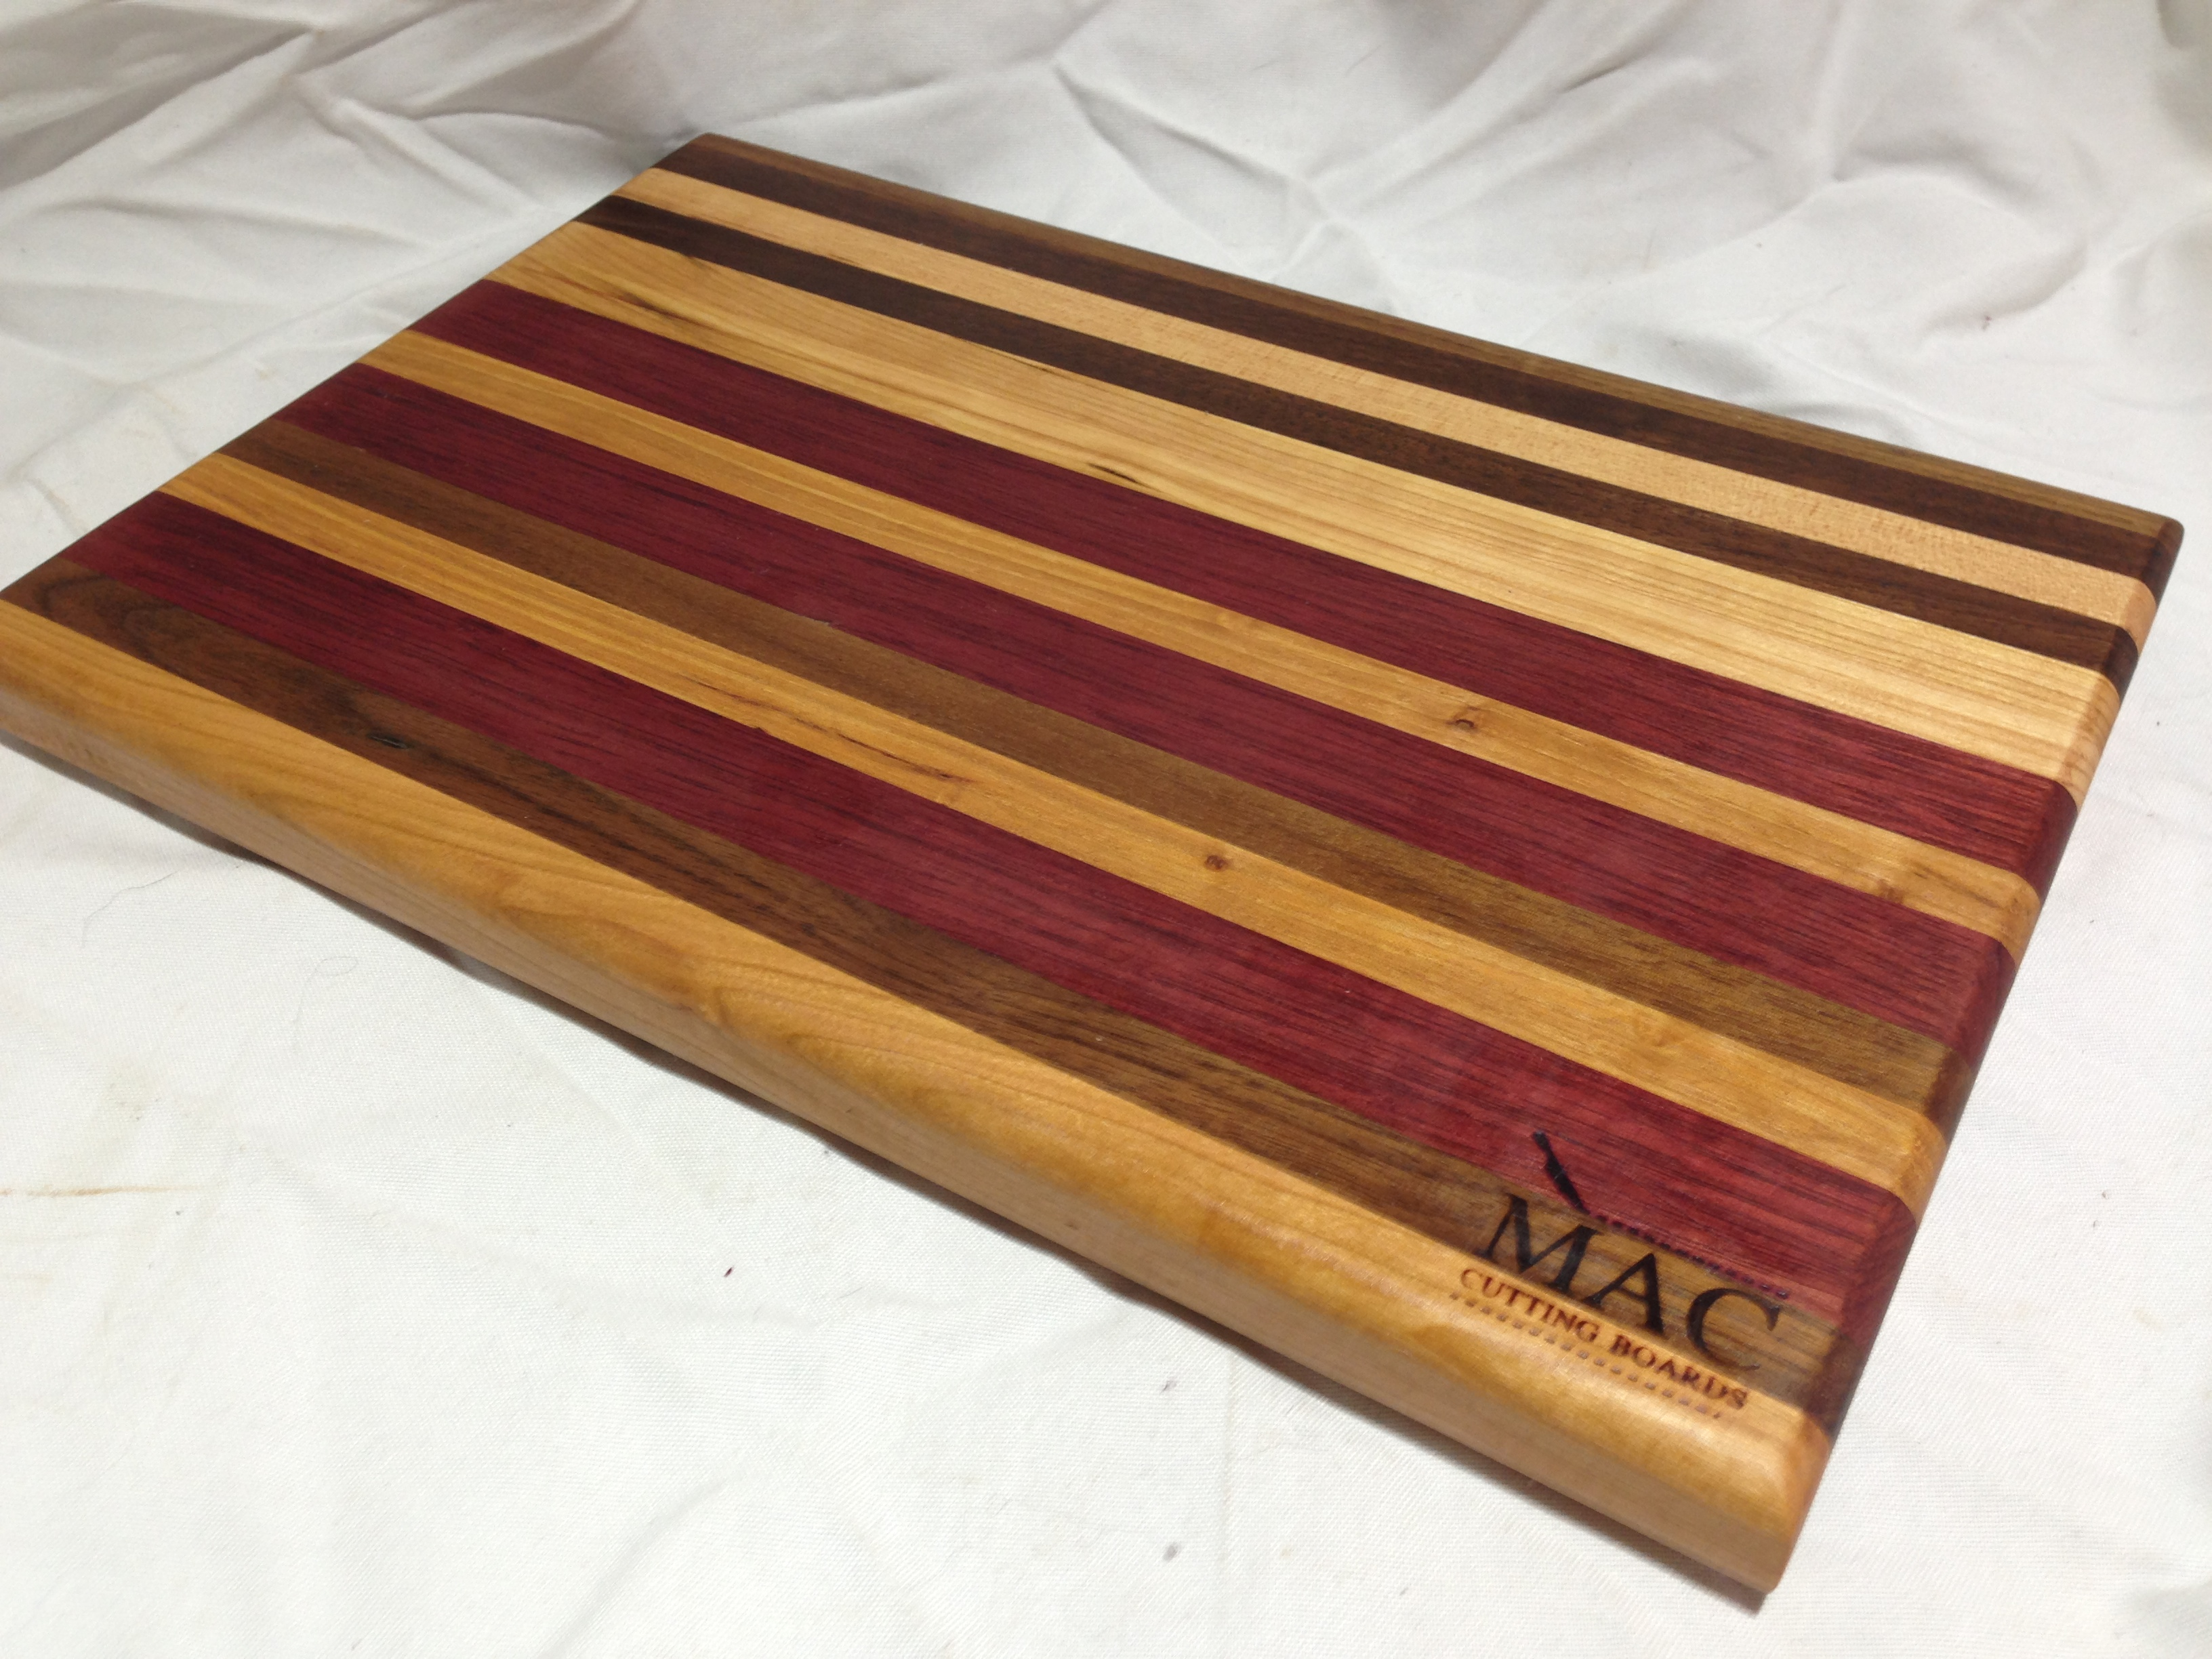 Hardwood Cutting Boards ~ Wood cutting board · mac boards online store